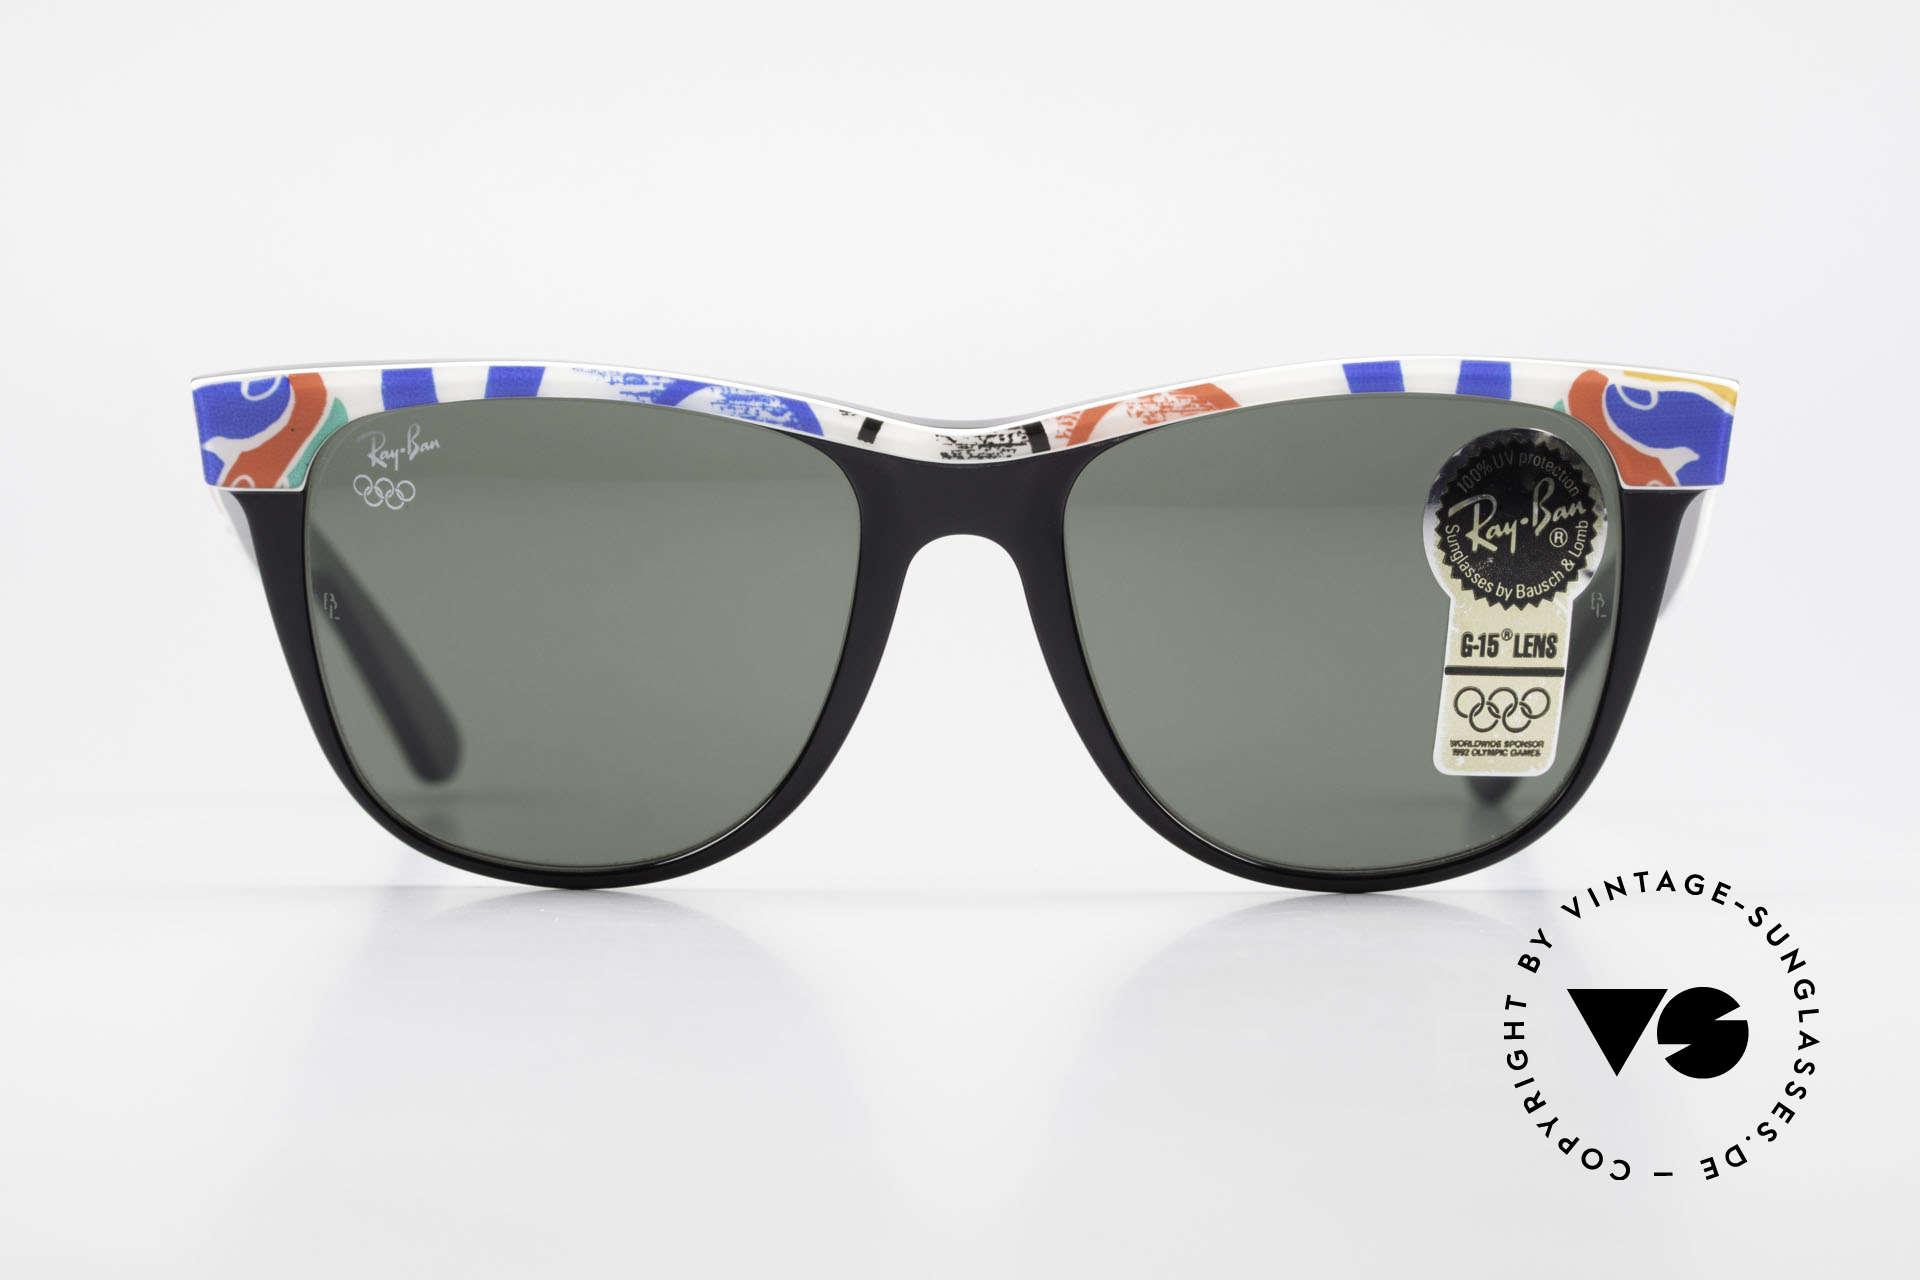 Ray Ban Wayfarer II Olympic Games 1992 Barcelona, limited Bausch&Lomb vintage Wayfarer sunglasses, Made for Men and Women